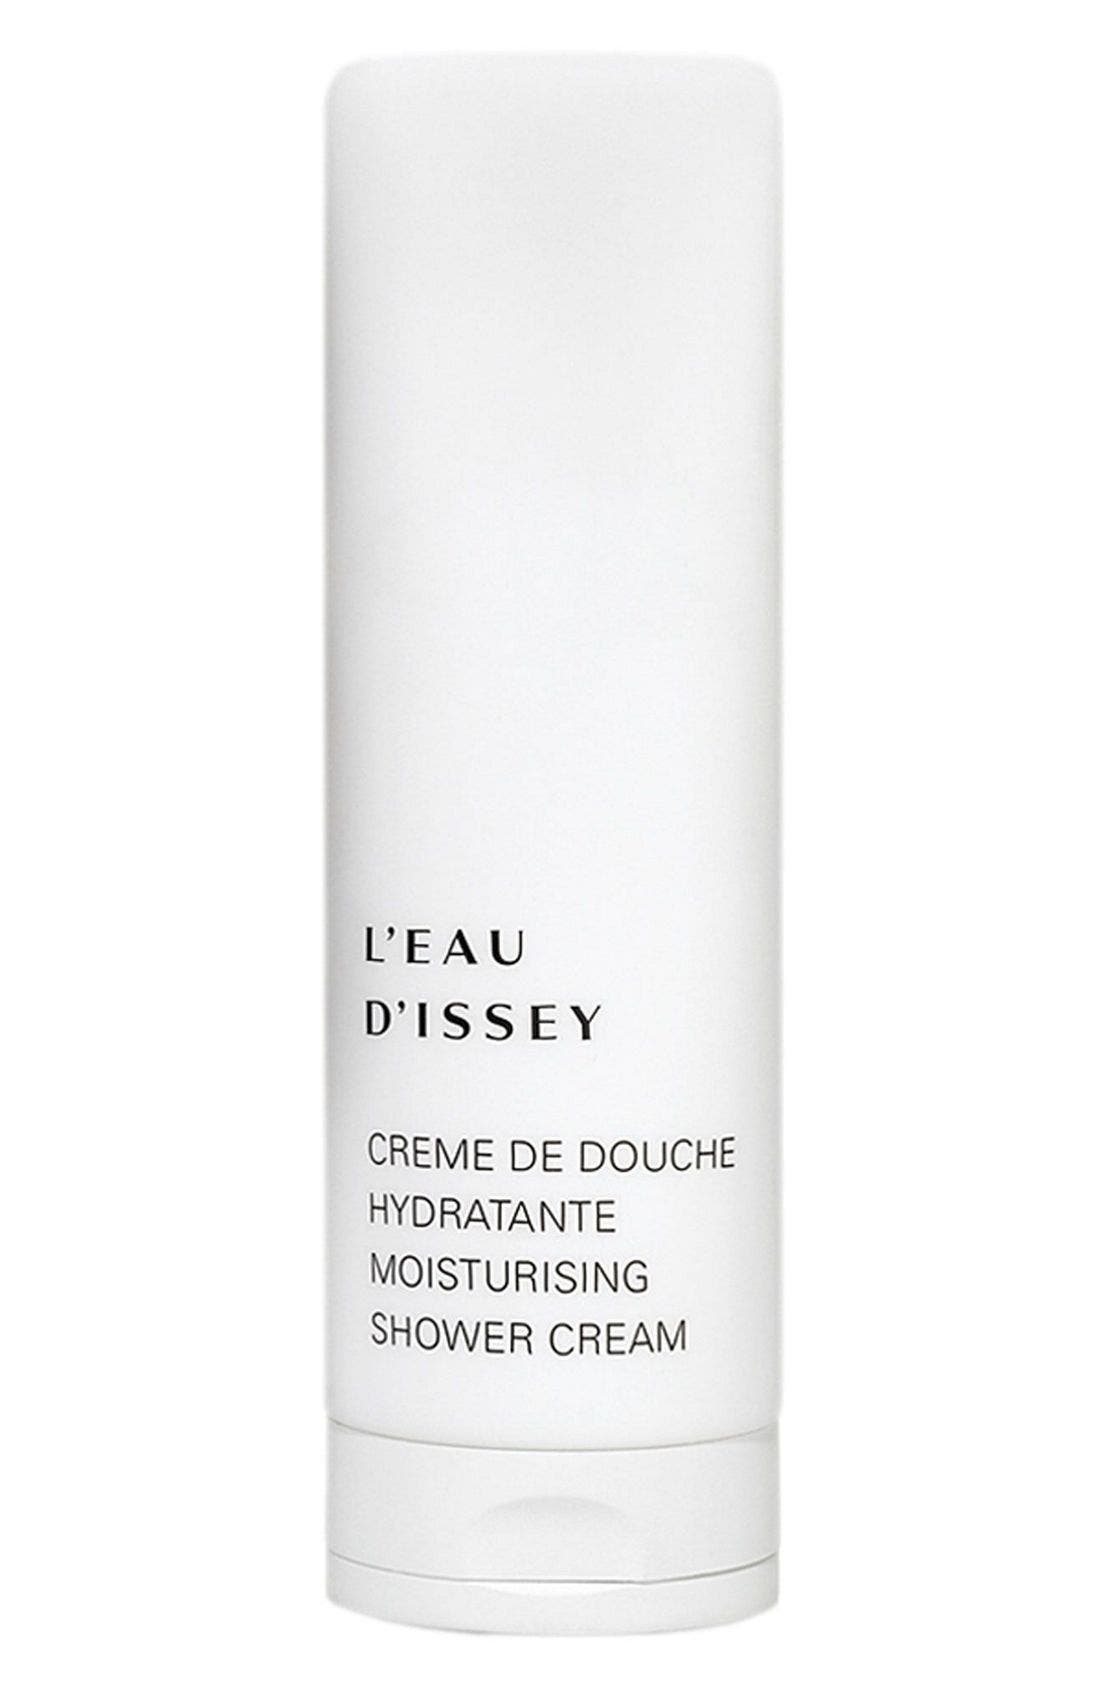 Issey Miyake 'L'Eau d'Issey' Moisturizing Shower Cream